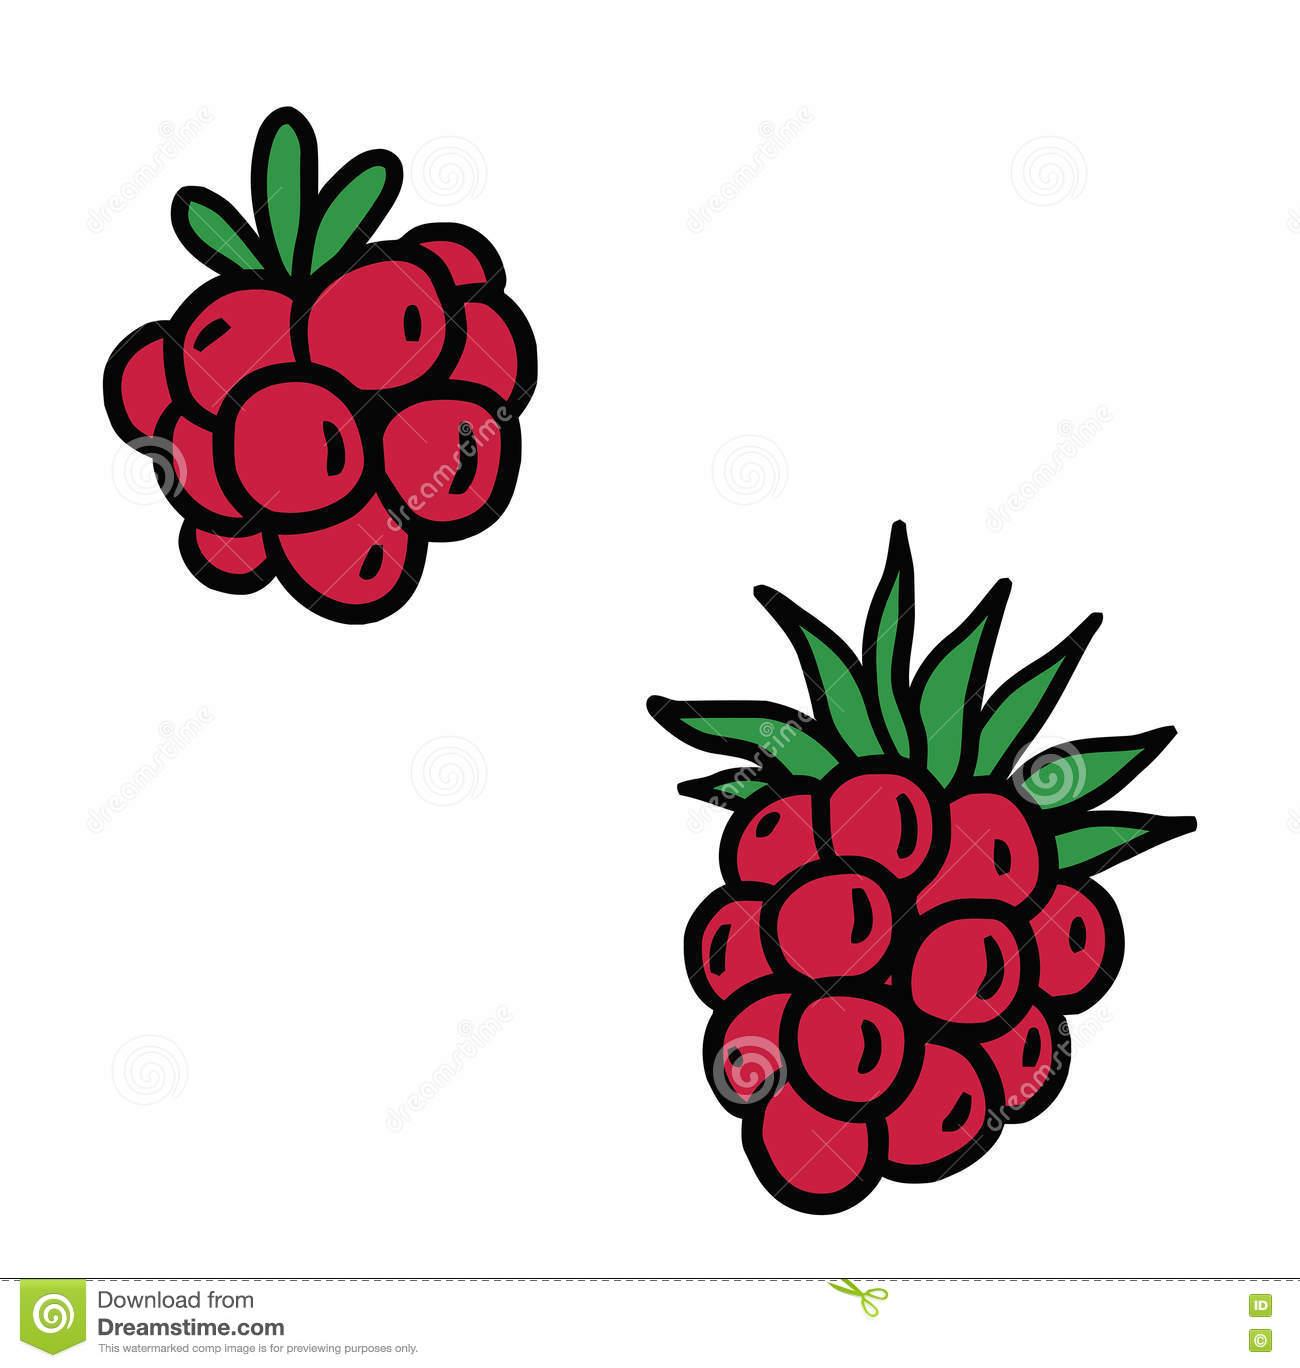 Berries stock illustration. Illustration of fruits, food.